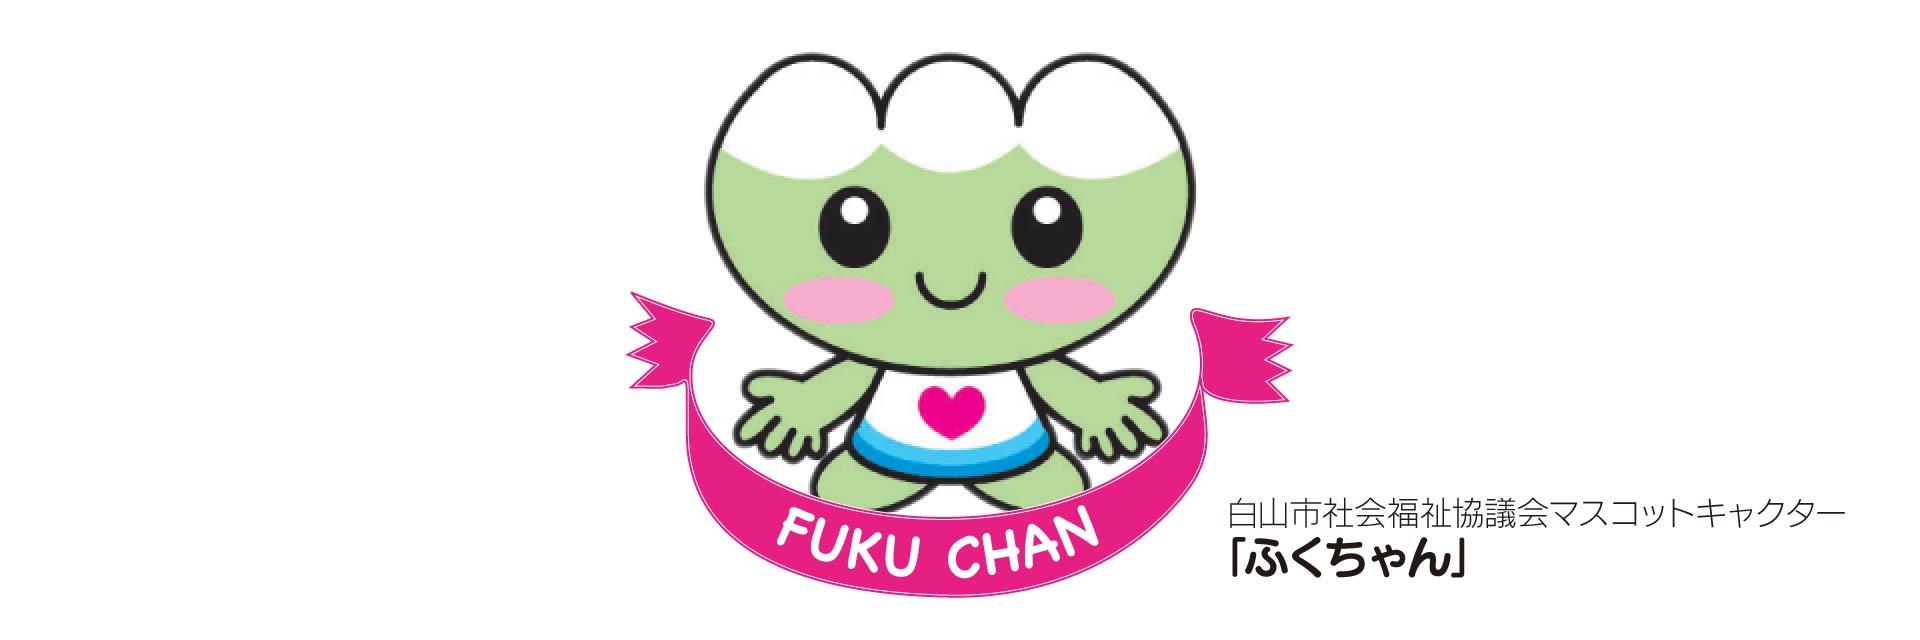 http://hakusanshi-syakyo.jp/wp-content/uploads/2019/05/topimg_fuku.jpgふくちゃんについて